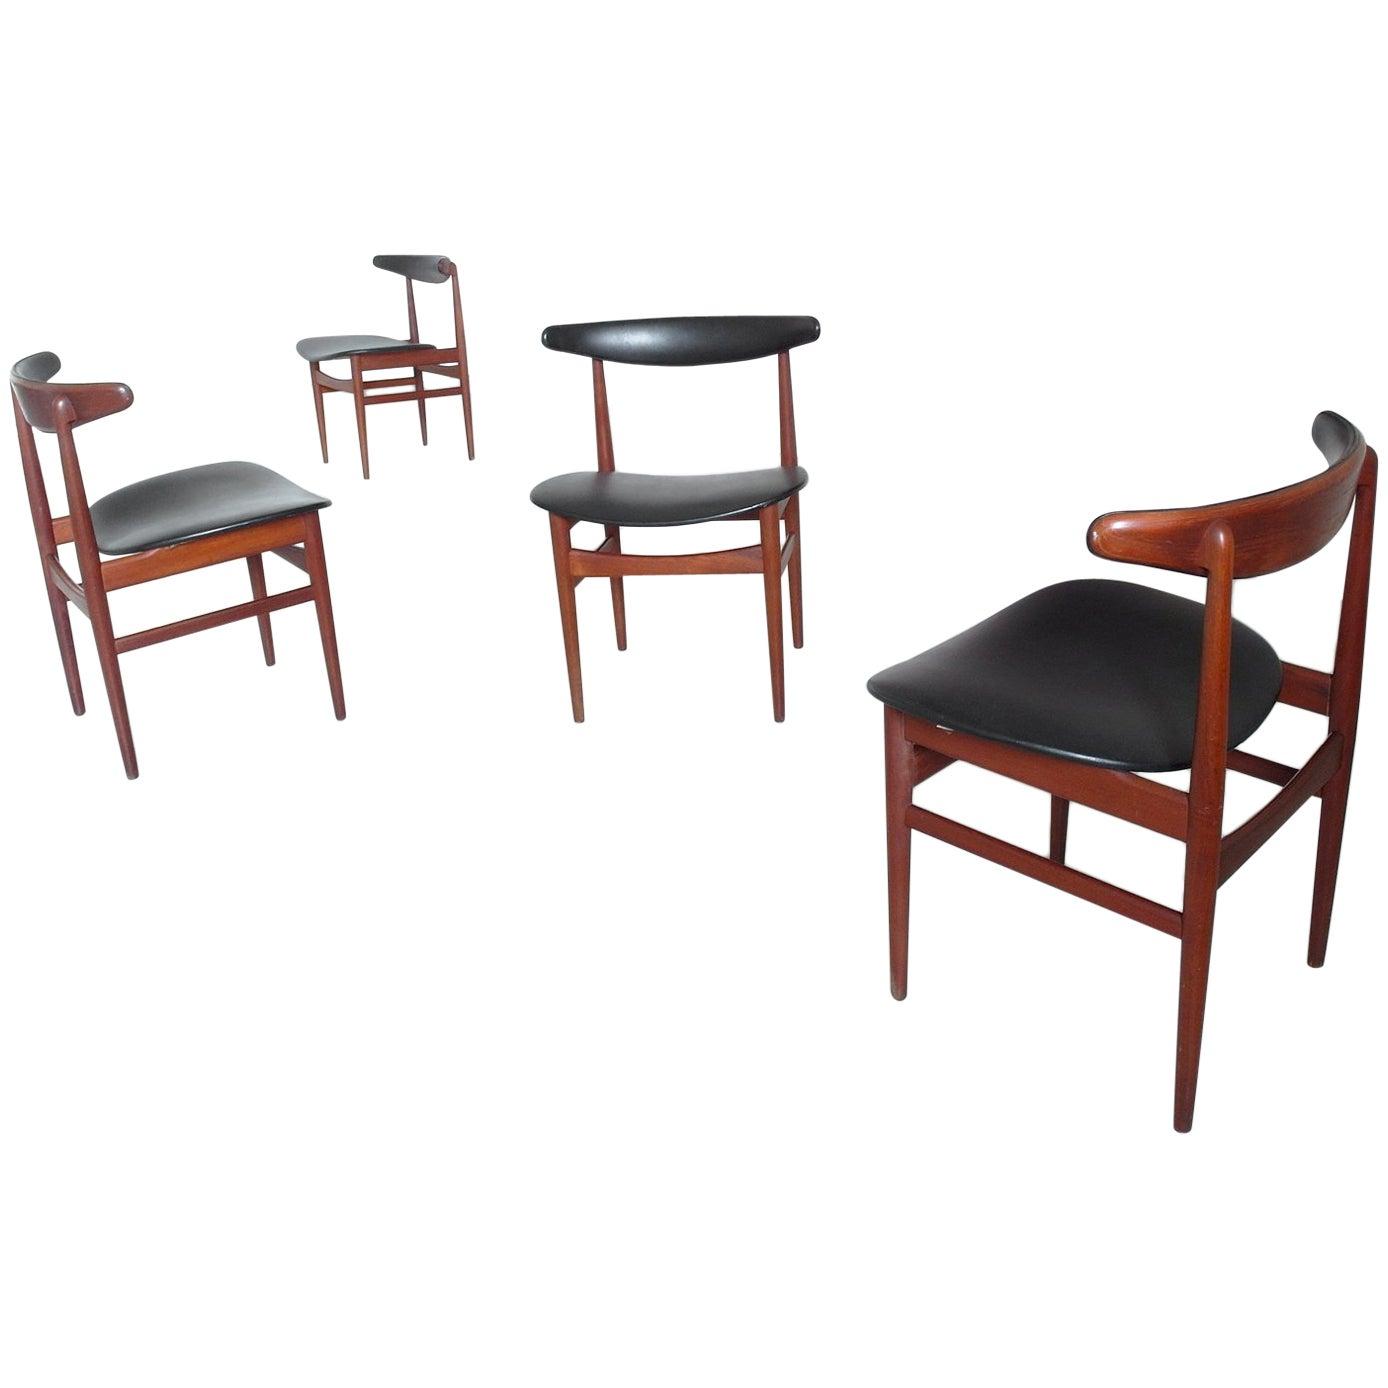 826b5957d060e Danish Modern Dining Chair Set Attributed Poul Hundevad for Vamdrup  Stolefabrik at 1stdibs